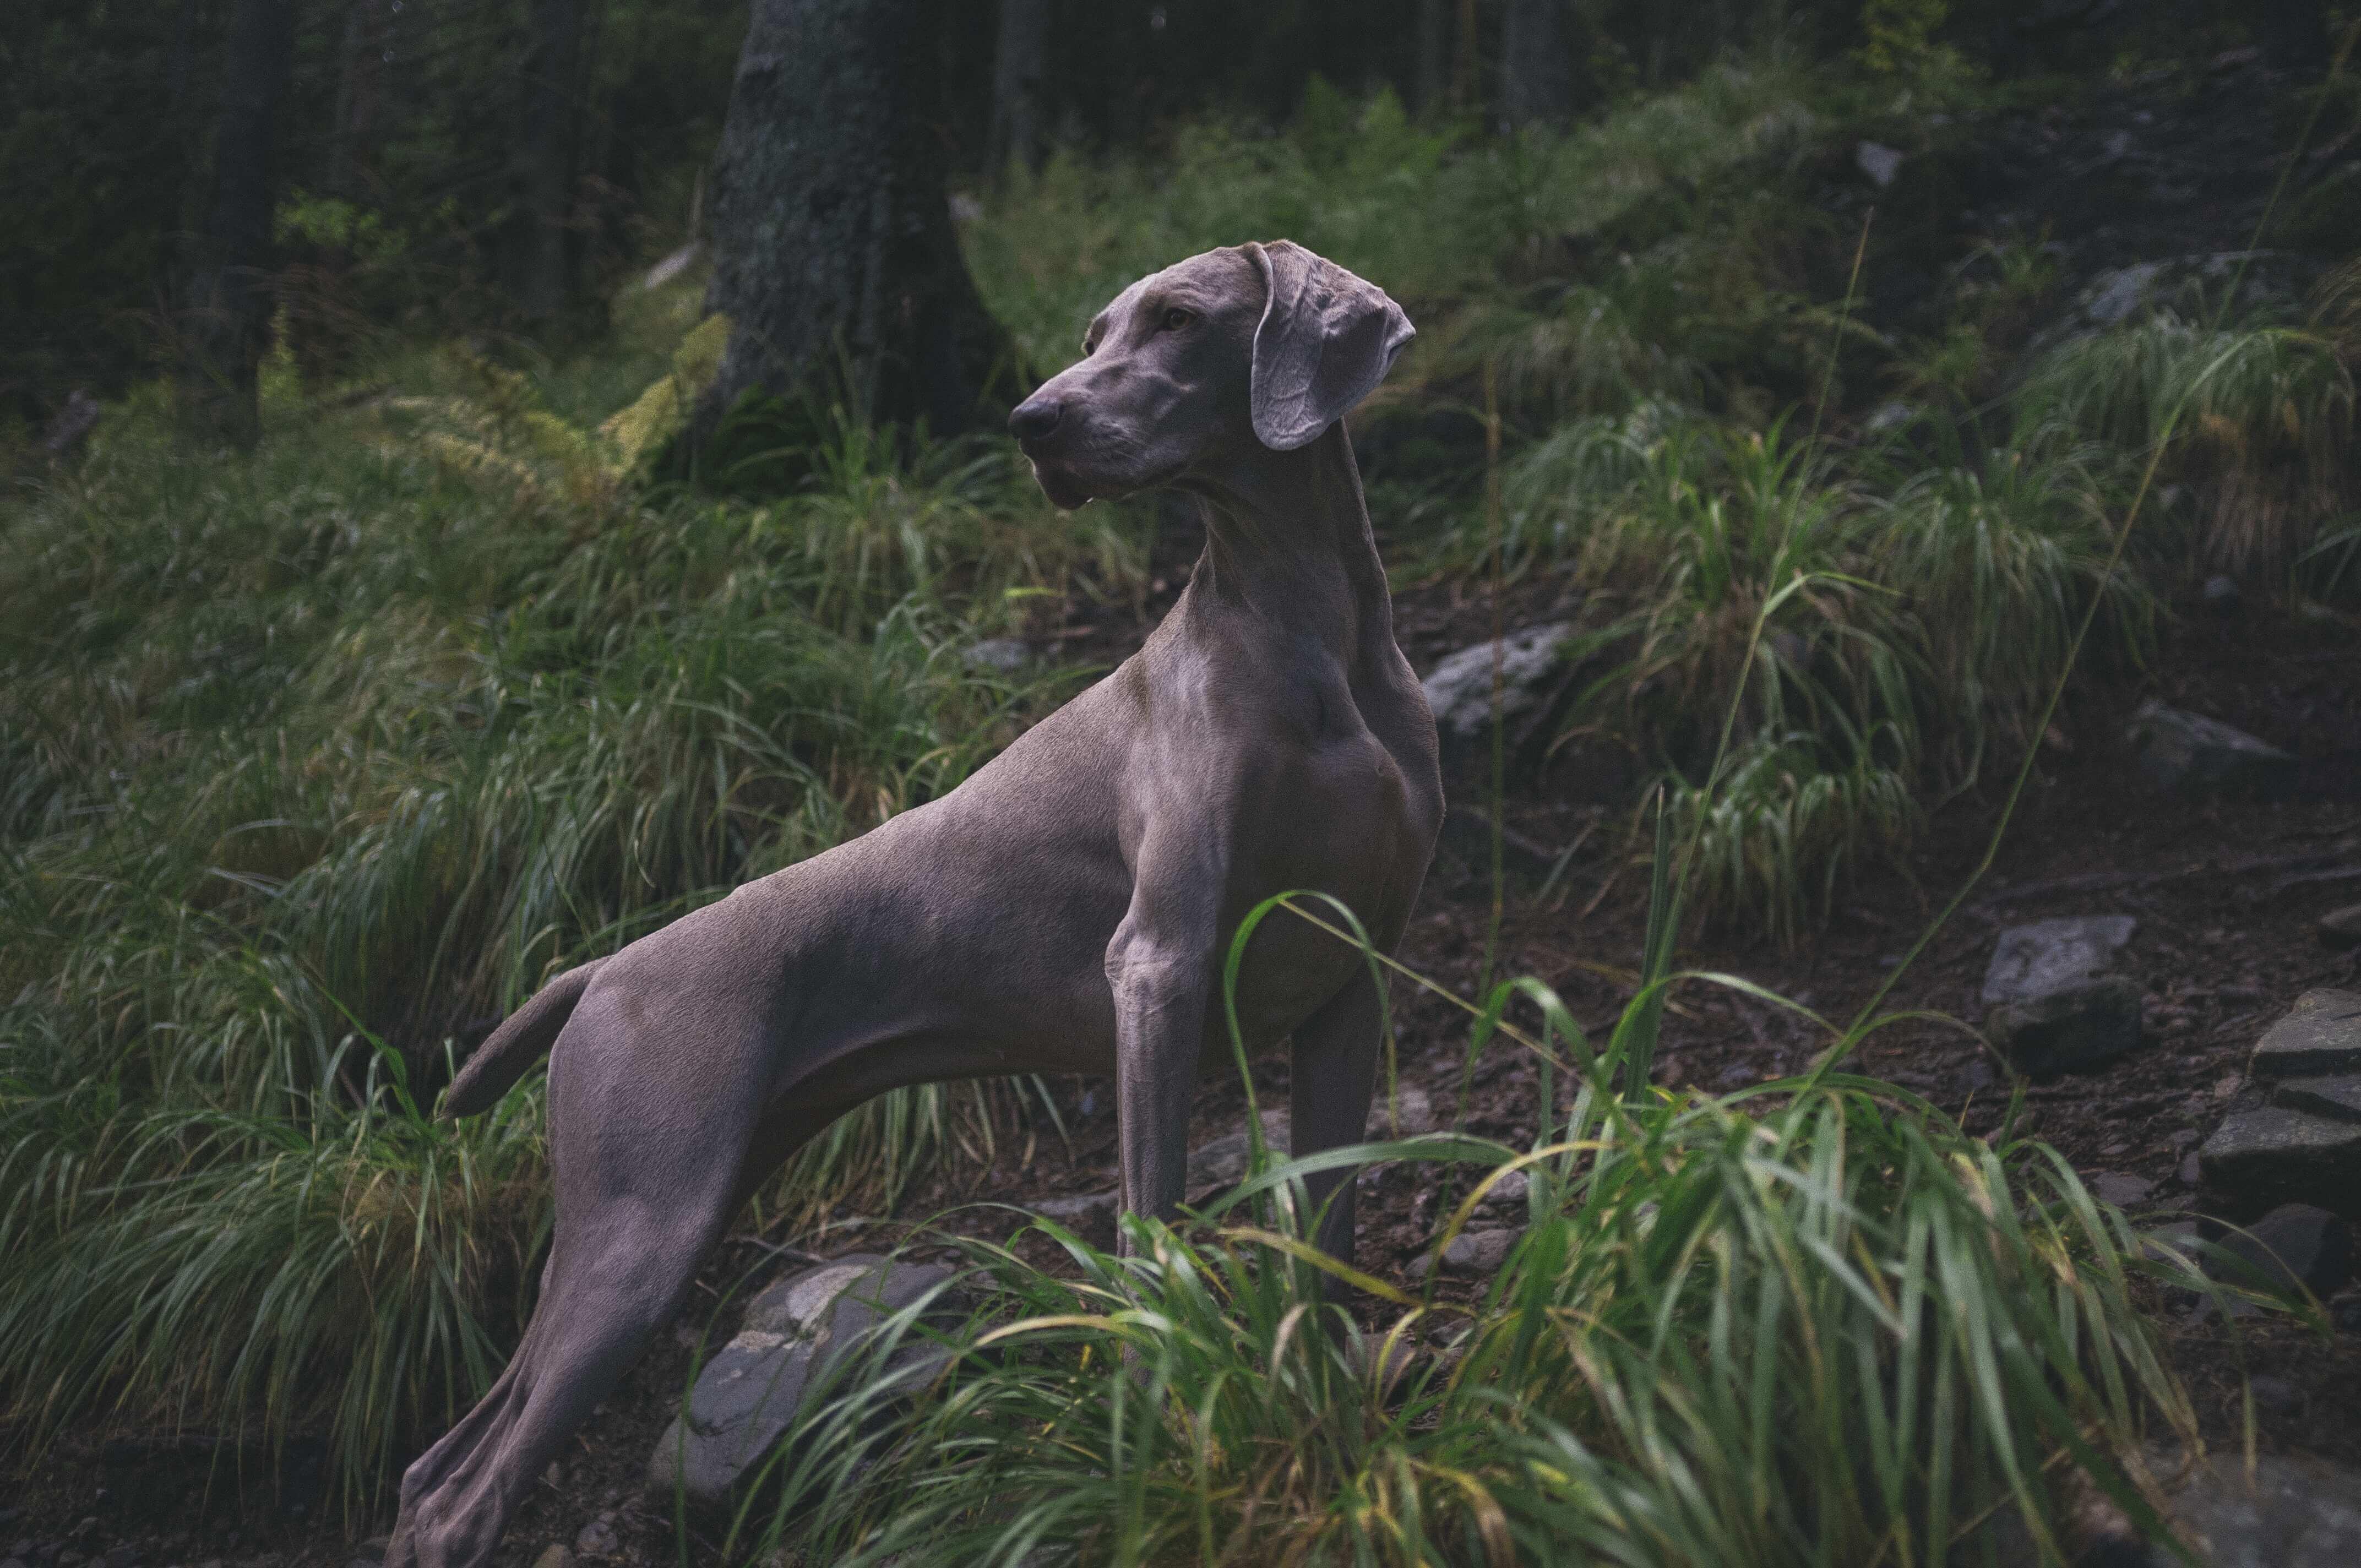 Hund Wald 1